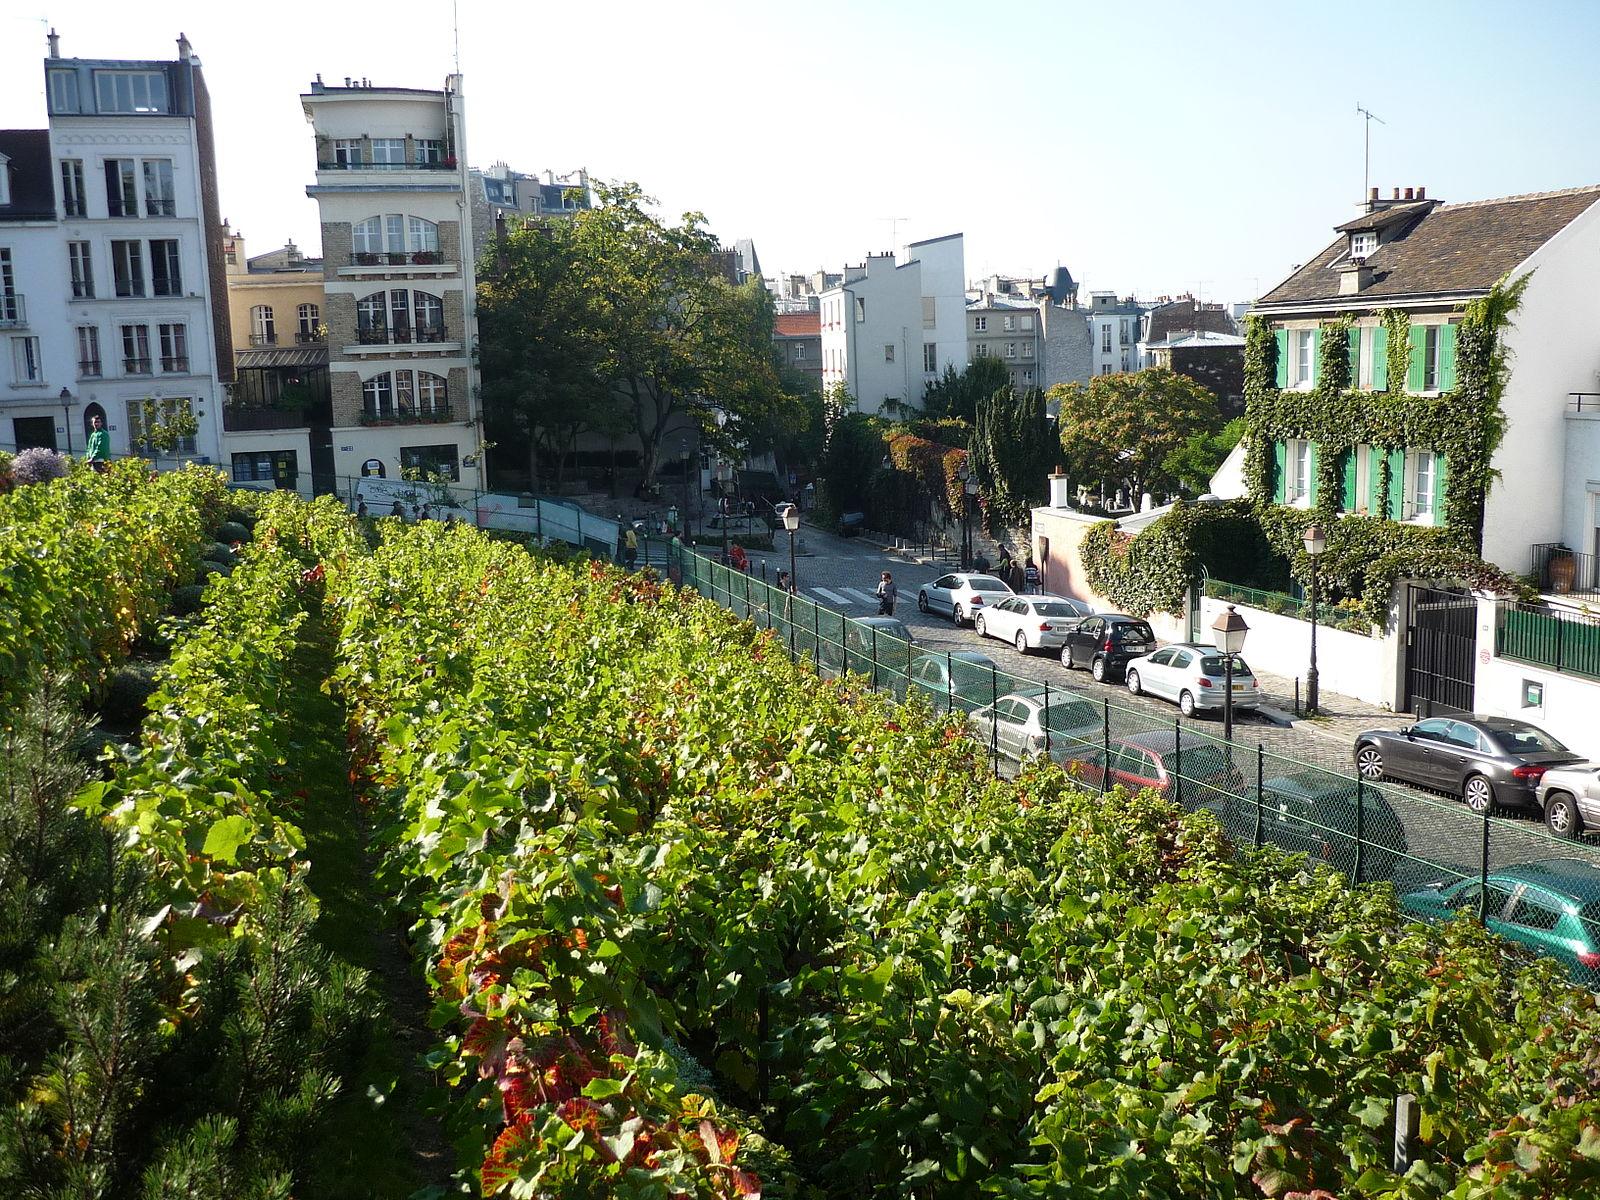 Basili [CC BY-SA 3.0 (https://creativecommons.org/licenses/by-sa/3.0)], Vigne de Montmartre, Michel Kalifa - Maison David